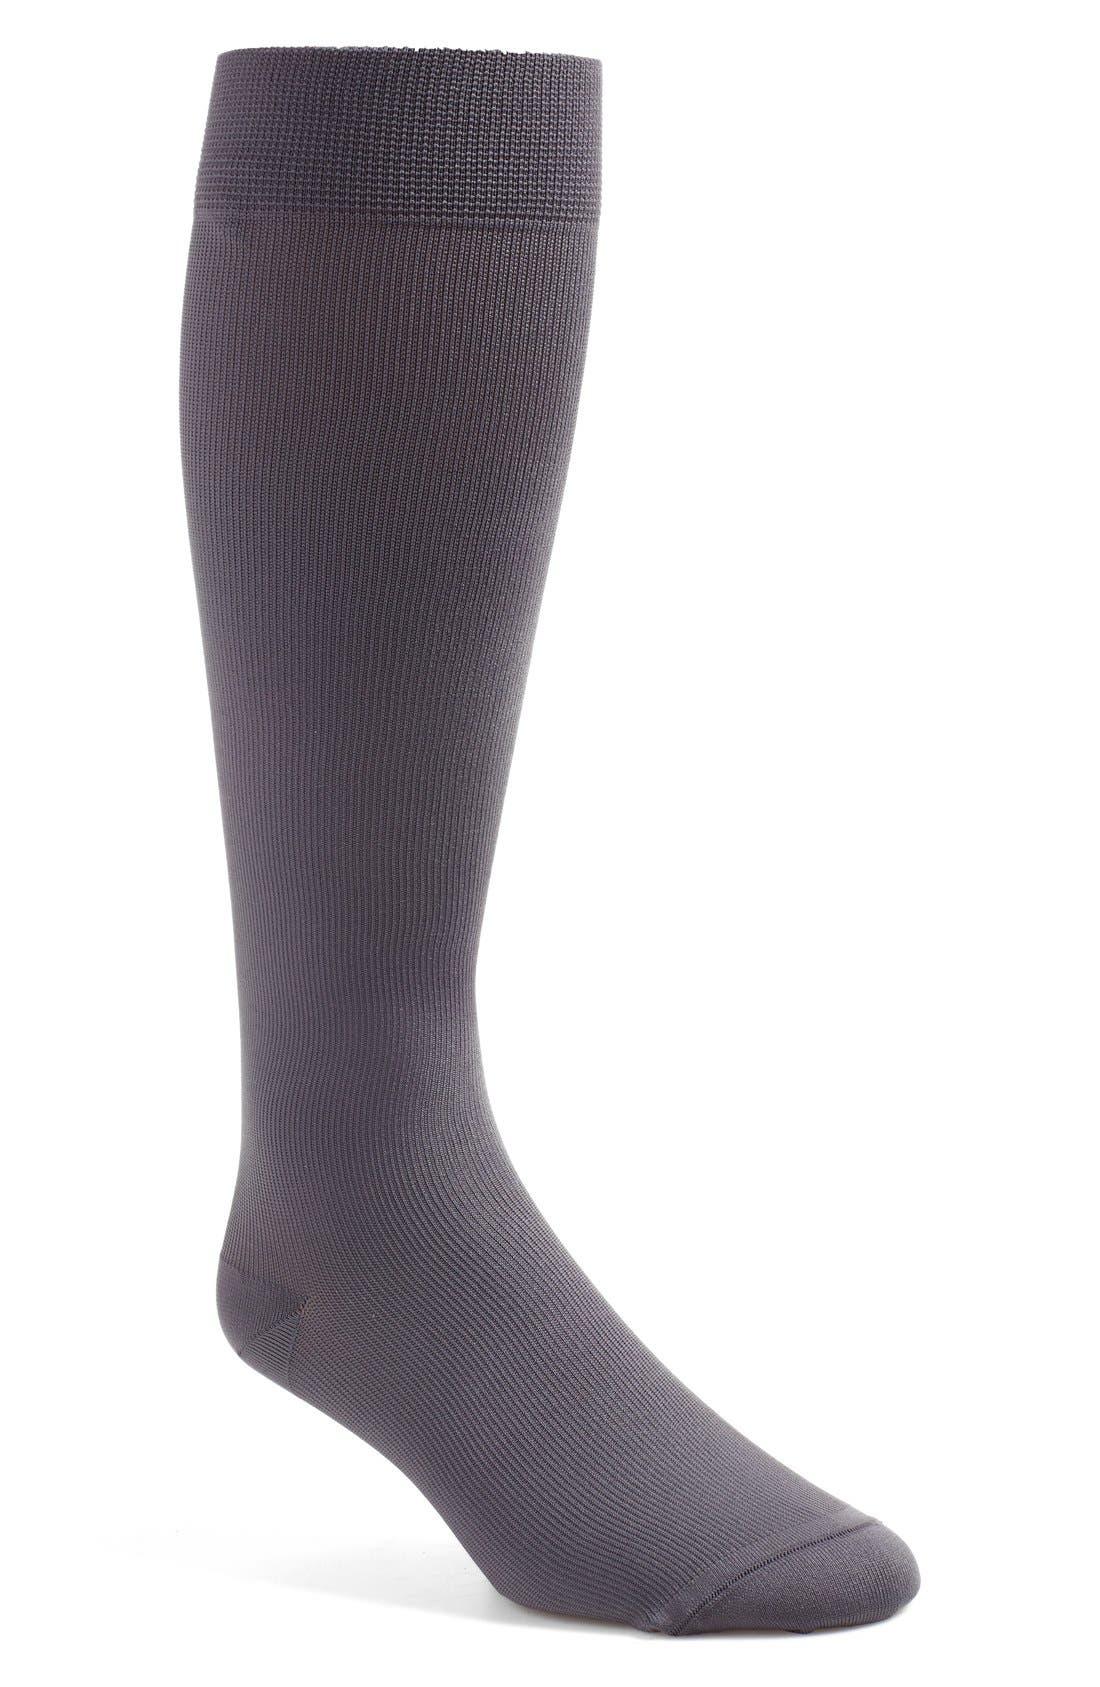 Main Image - INSIGNIA by SIGVARIS'Keynote' OvertheCalf Socks